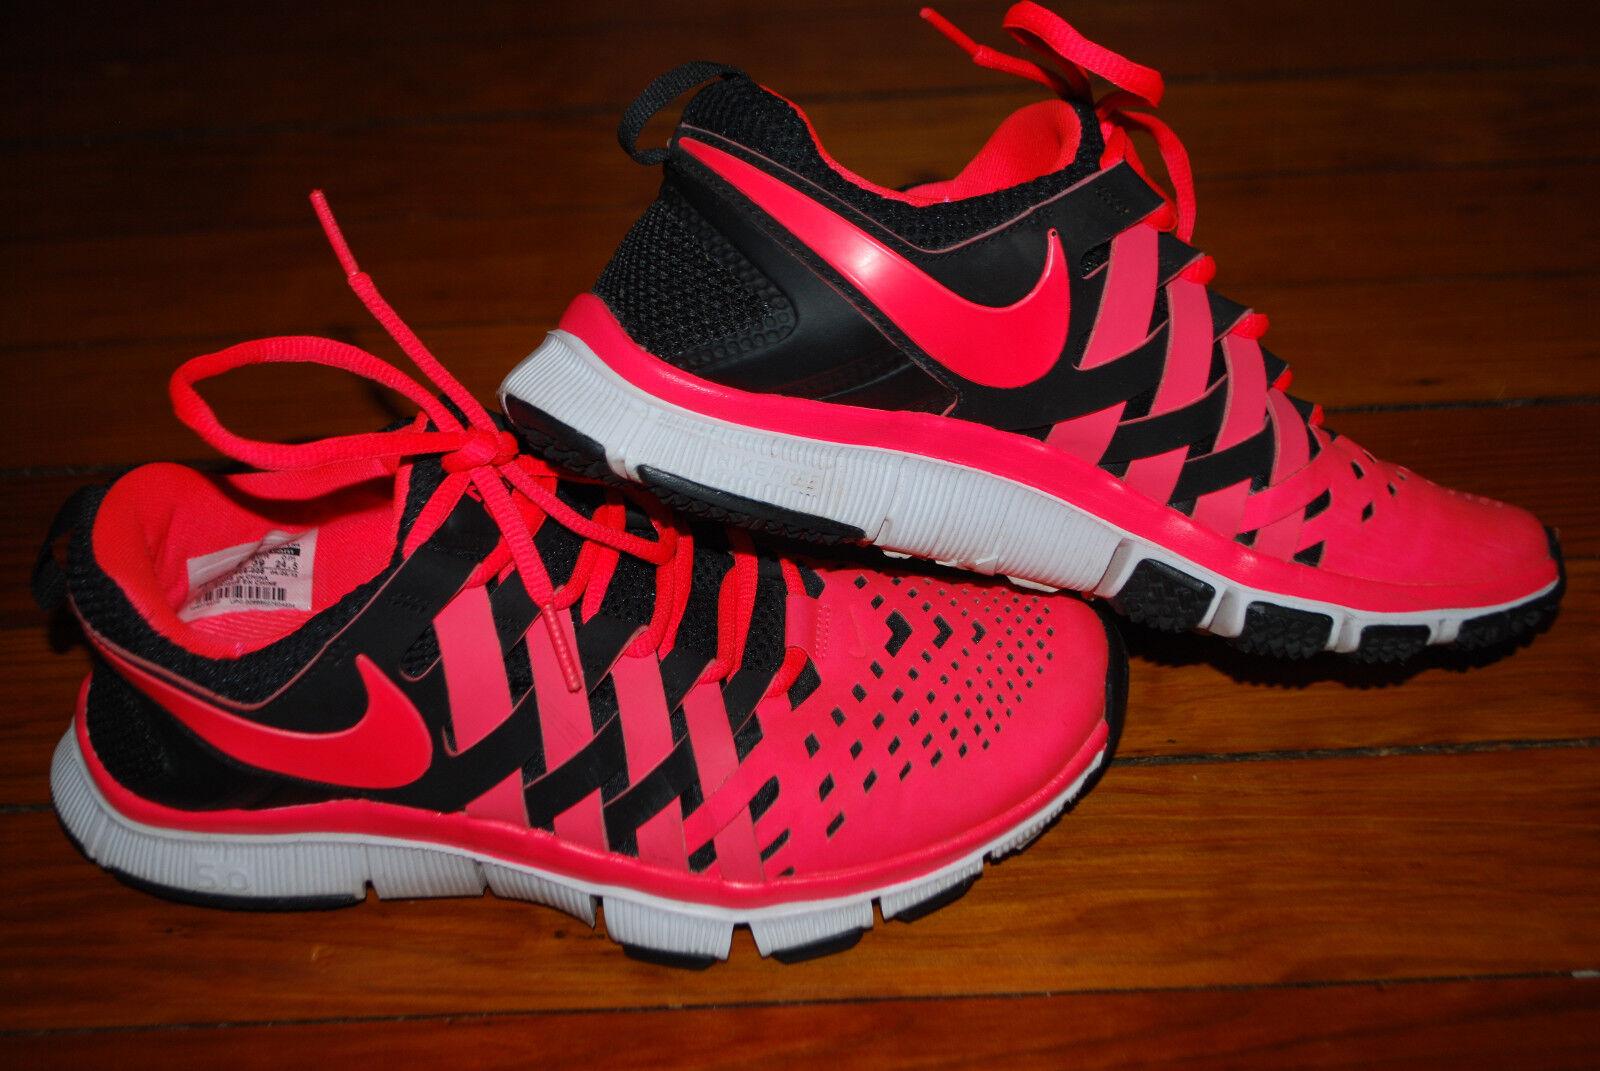 super popular 8ef8e f03ae Men s Nike Free Trainer 5 0 Weave Sneakers (6.5) White   Black   Atomic